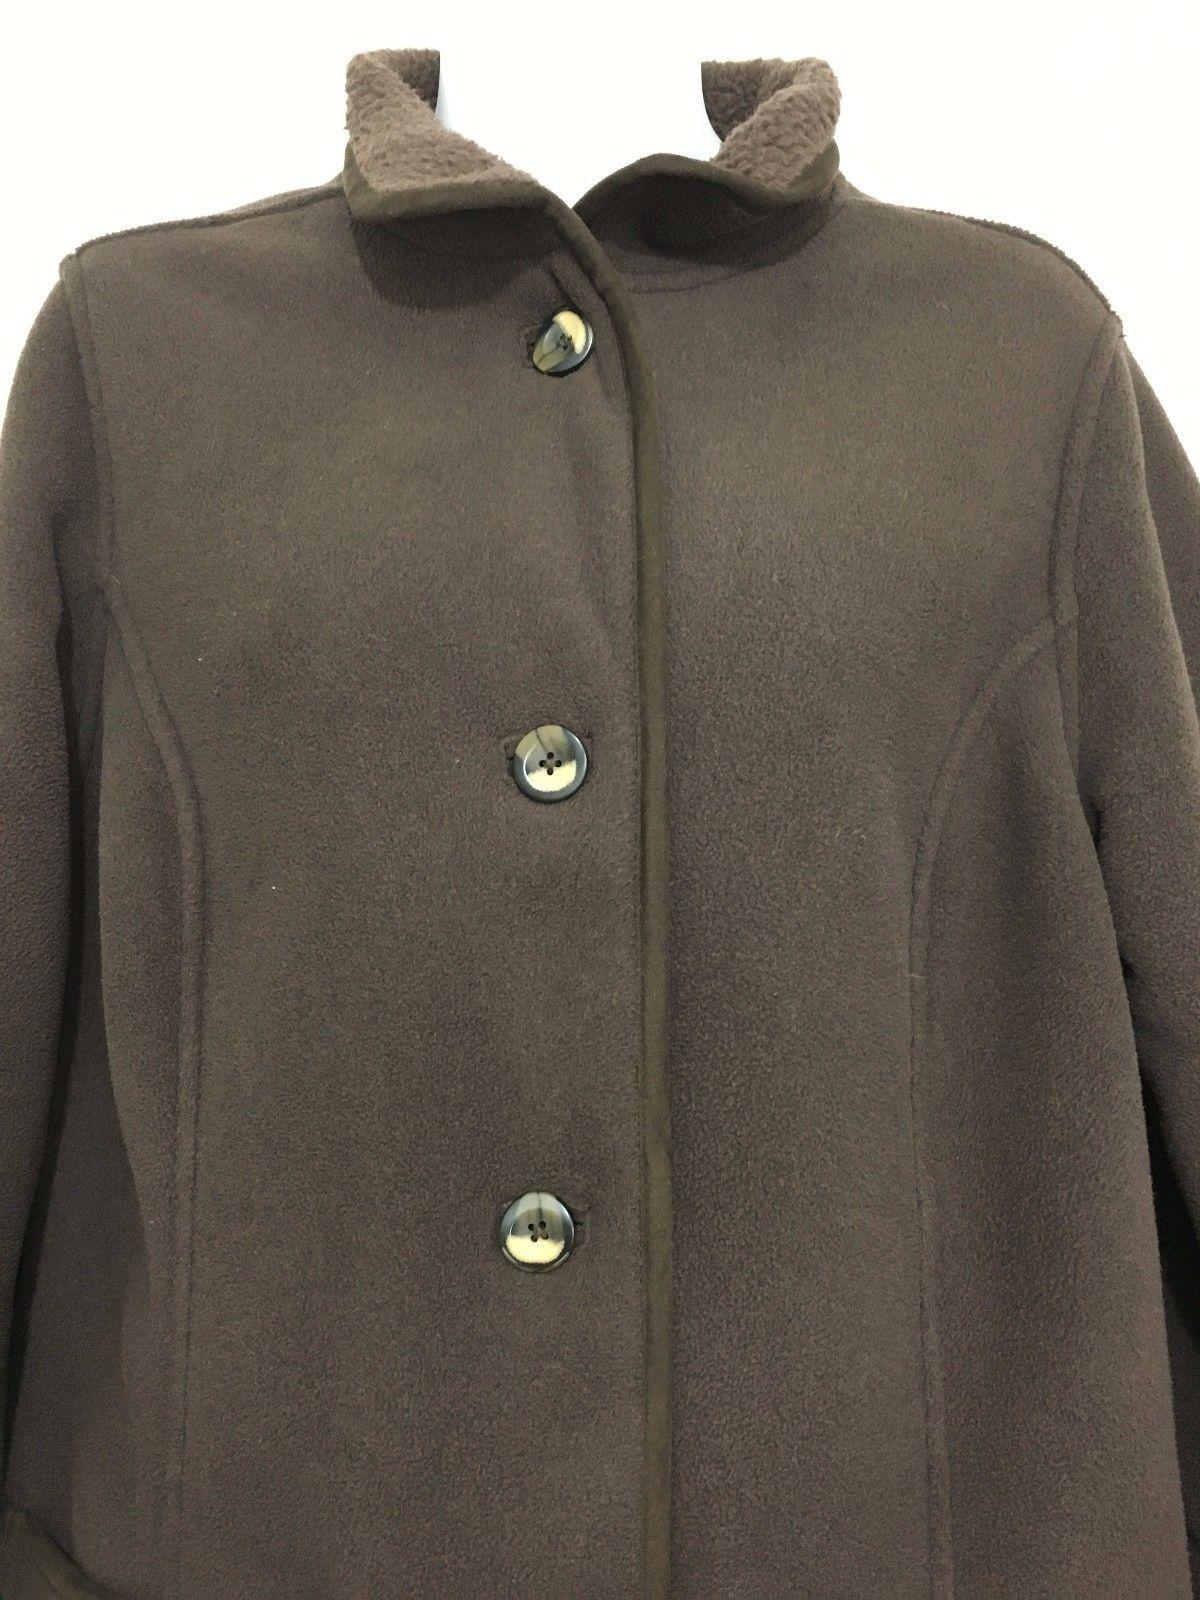 LL Bean Womens M Reg Brown Polartec Fleece Barn Coat Jacket